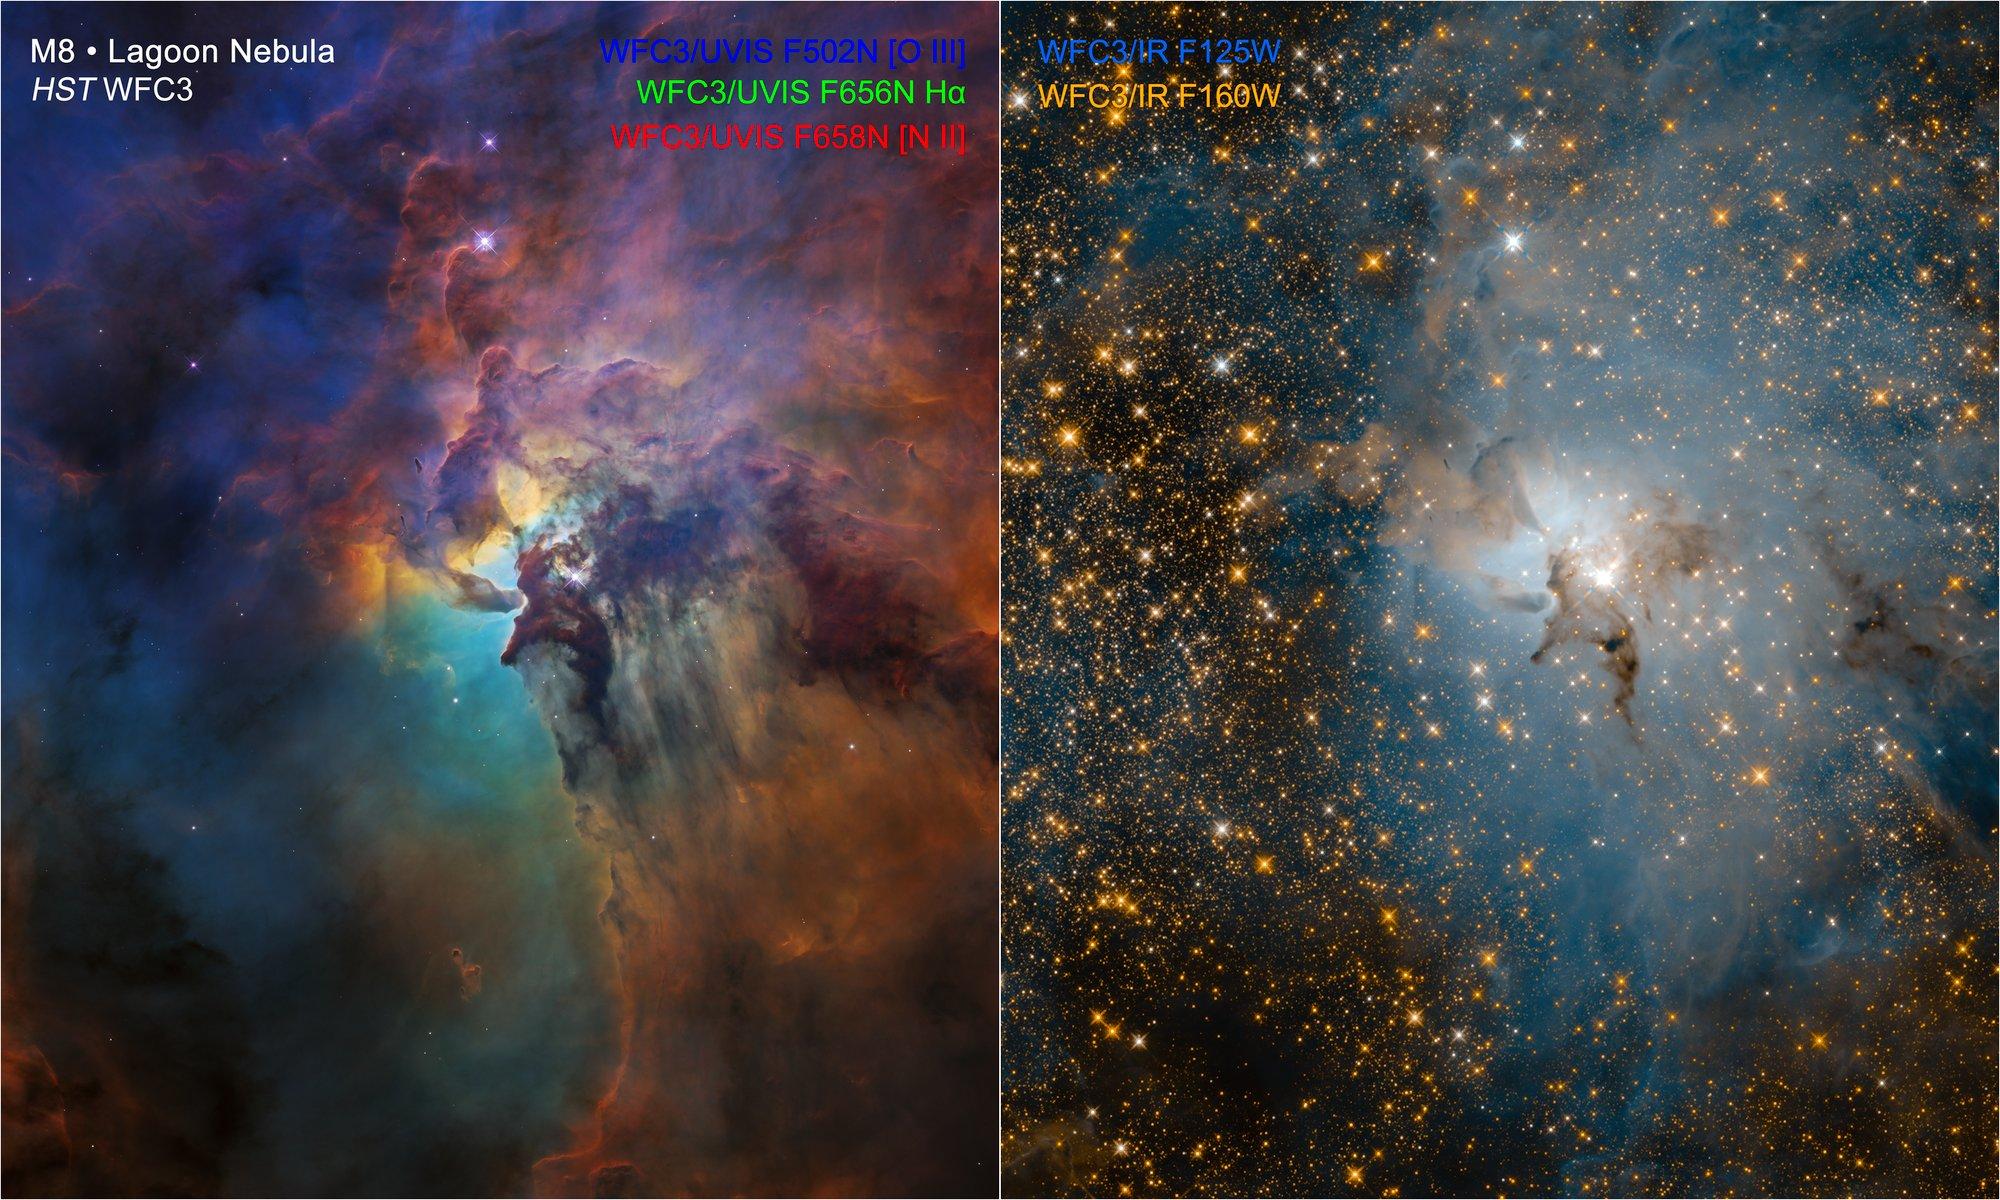 Breathtaking Nasa Hubble Space Hd Wallpapers: Two Hubble Views Of The Same Stellar Nursery